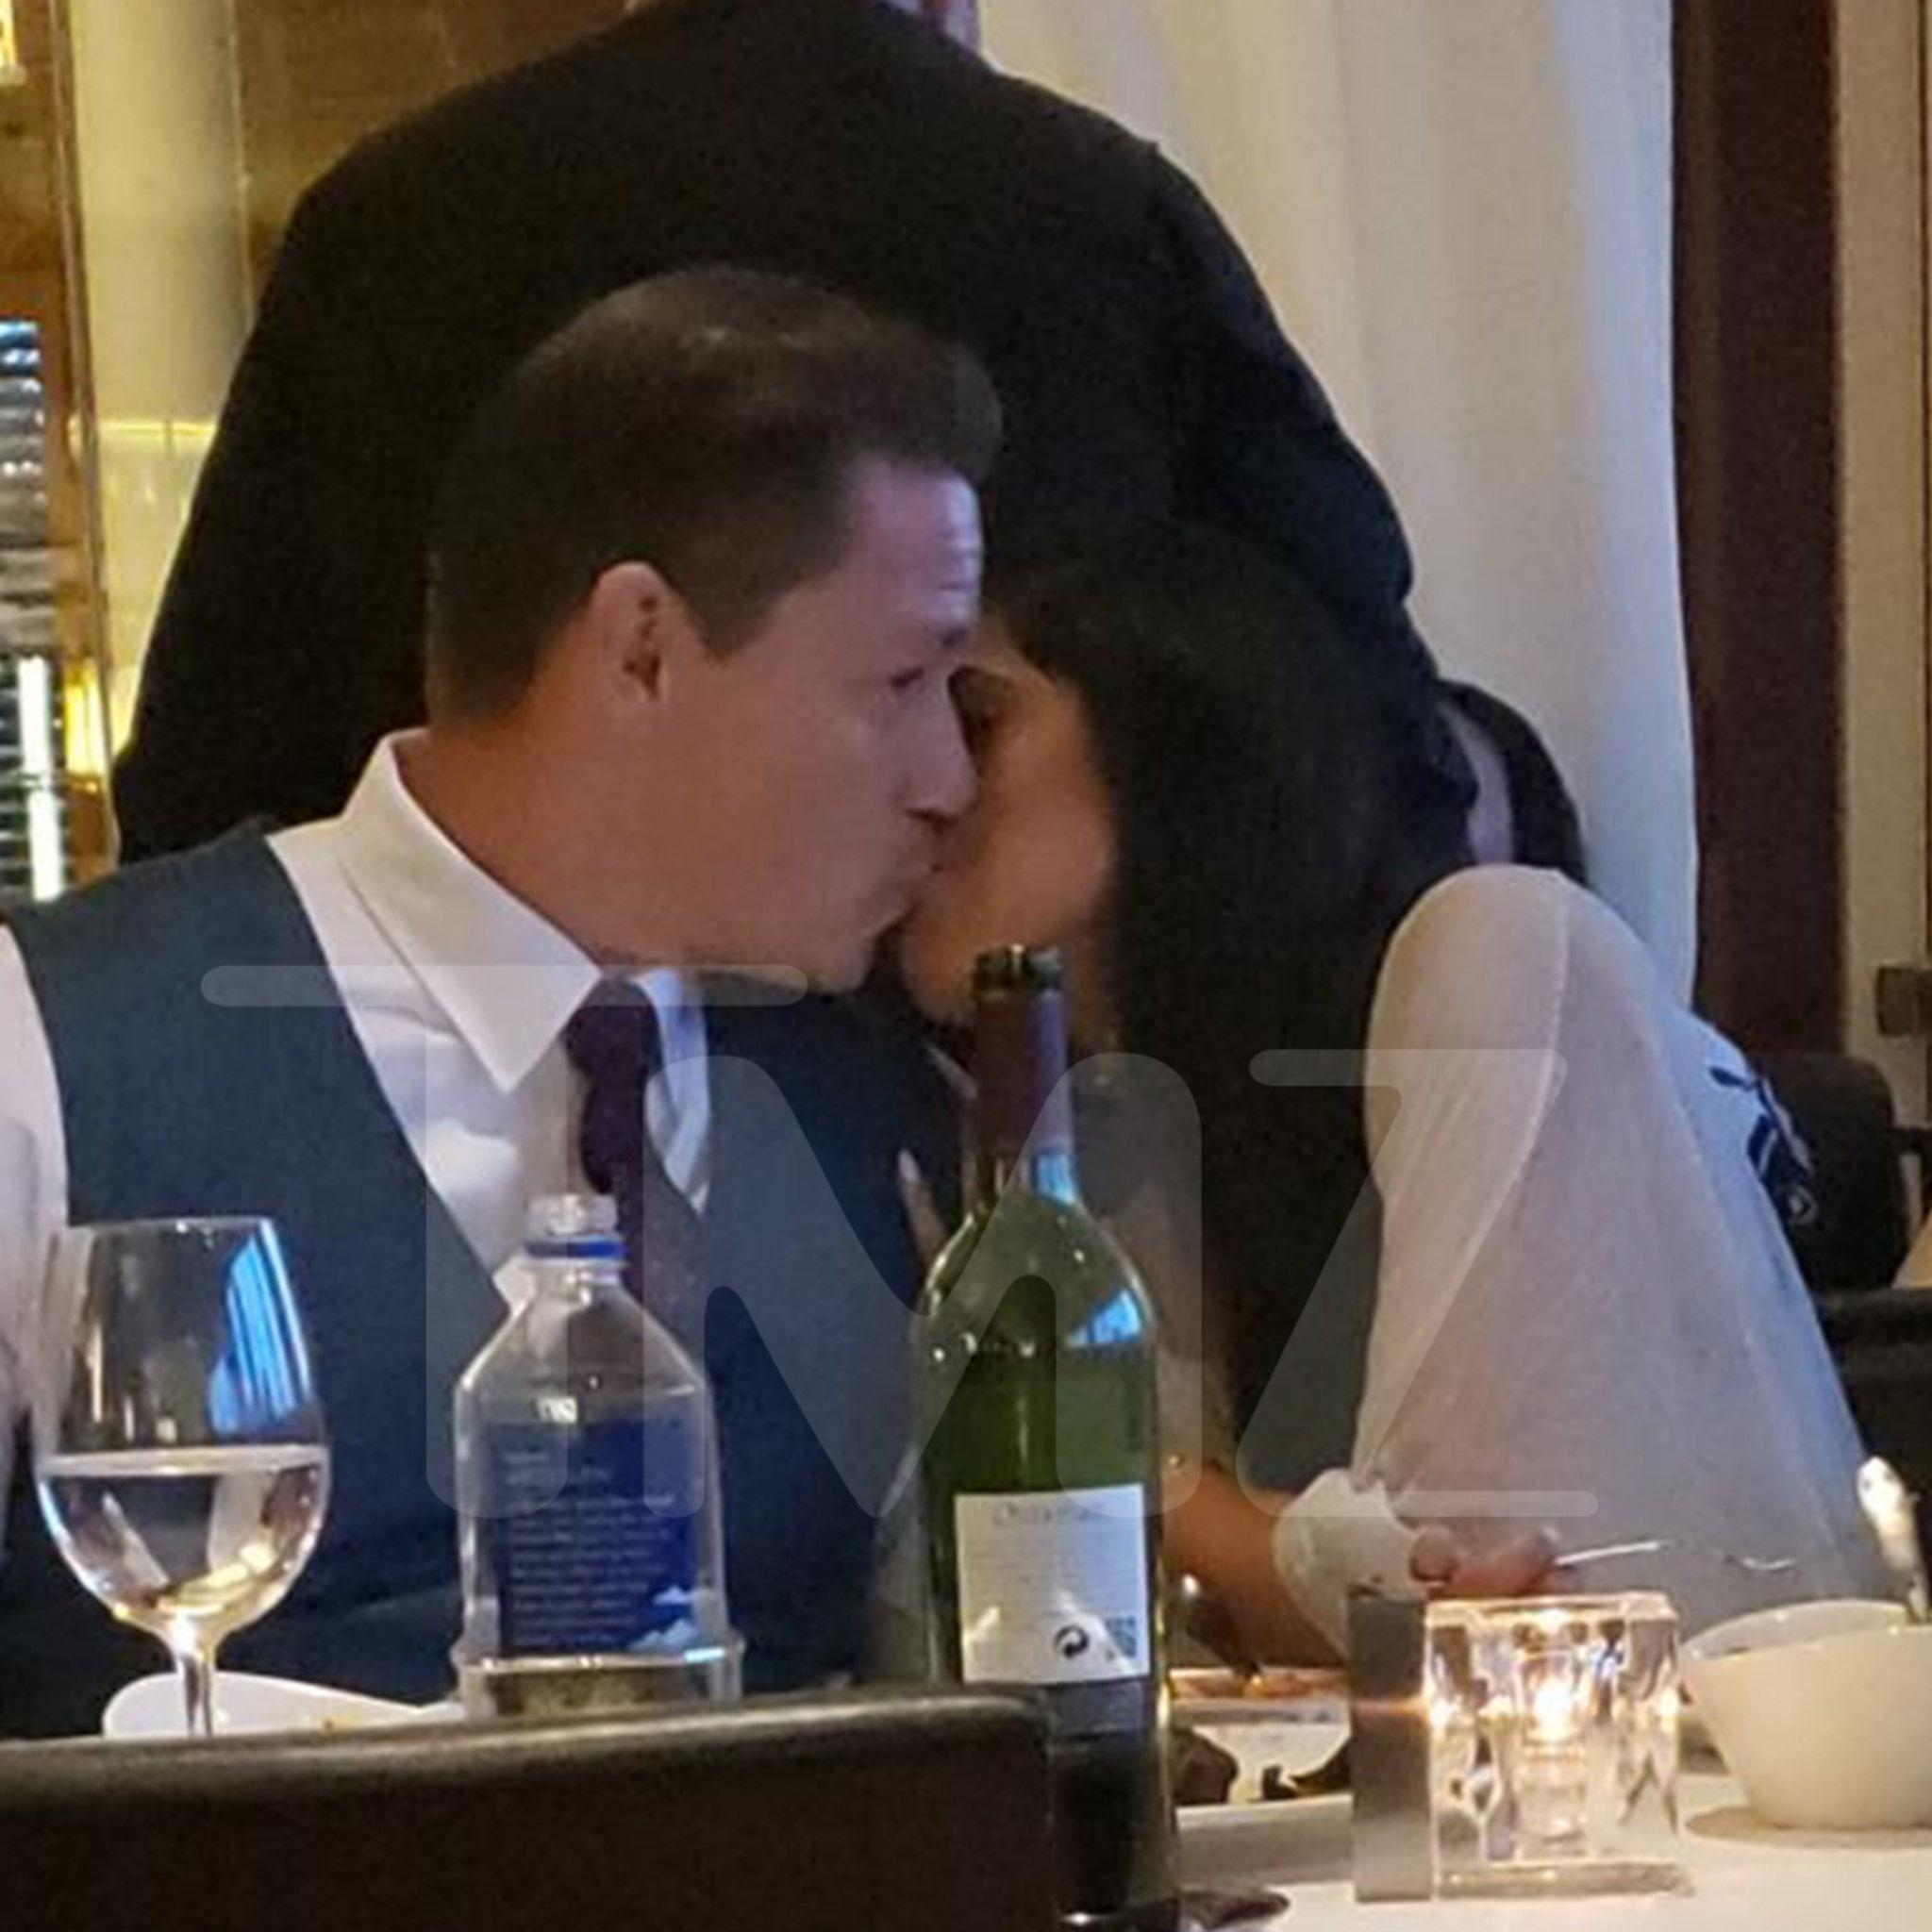 John Cena Kissing Girlfriend Shay at Restaurant